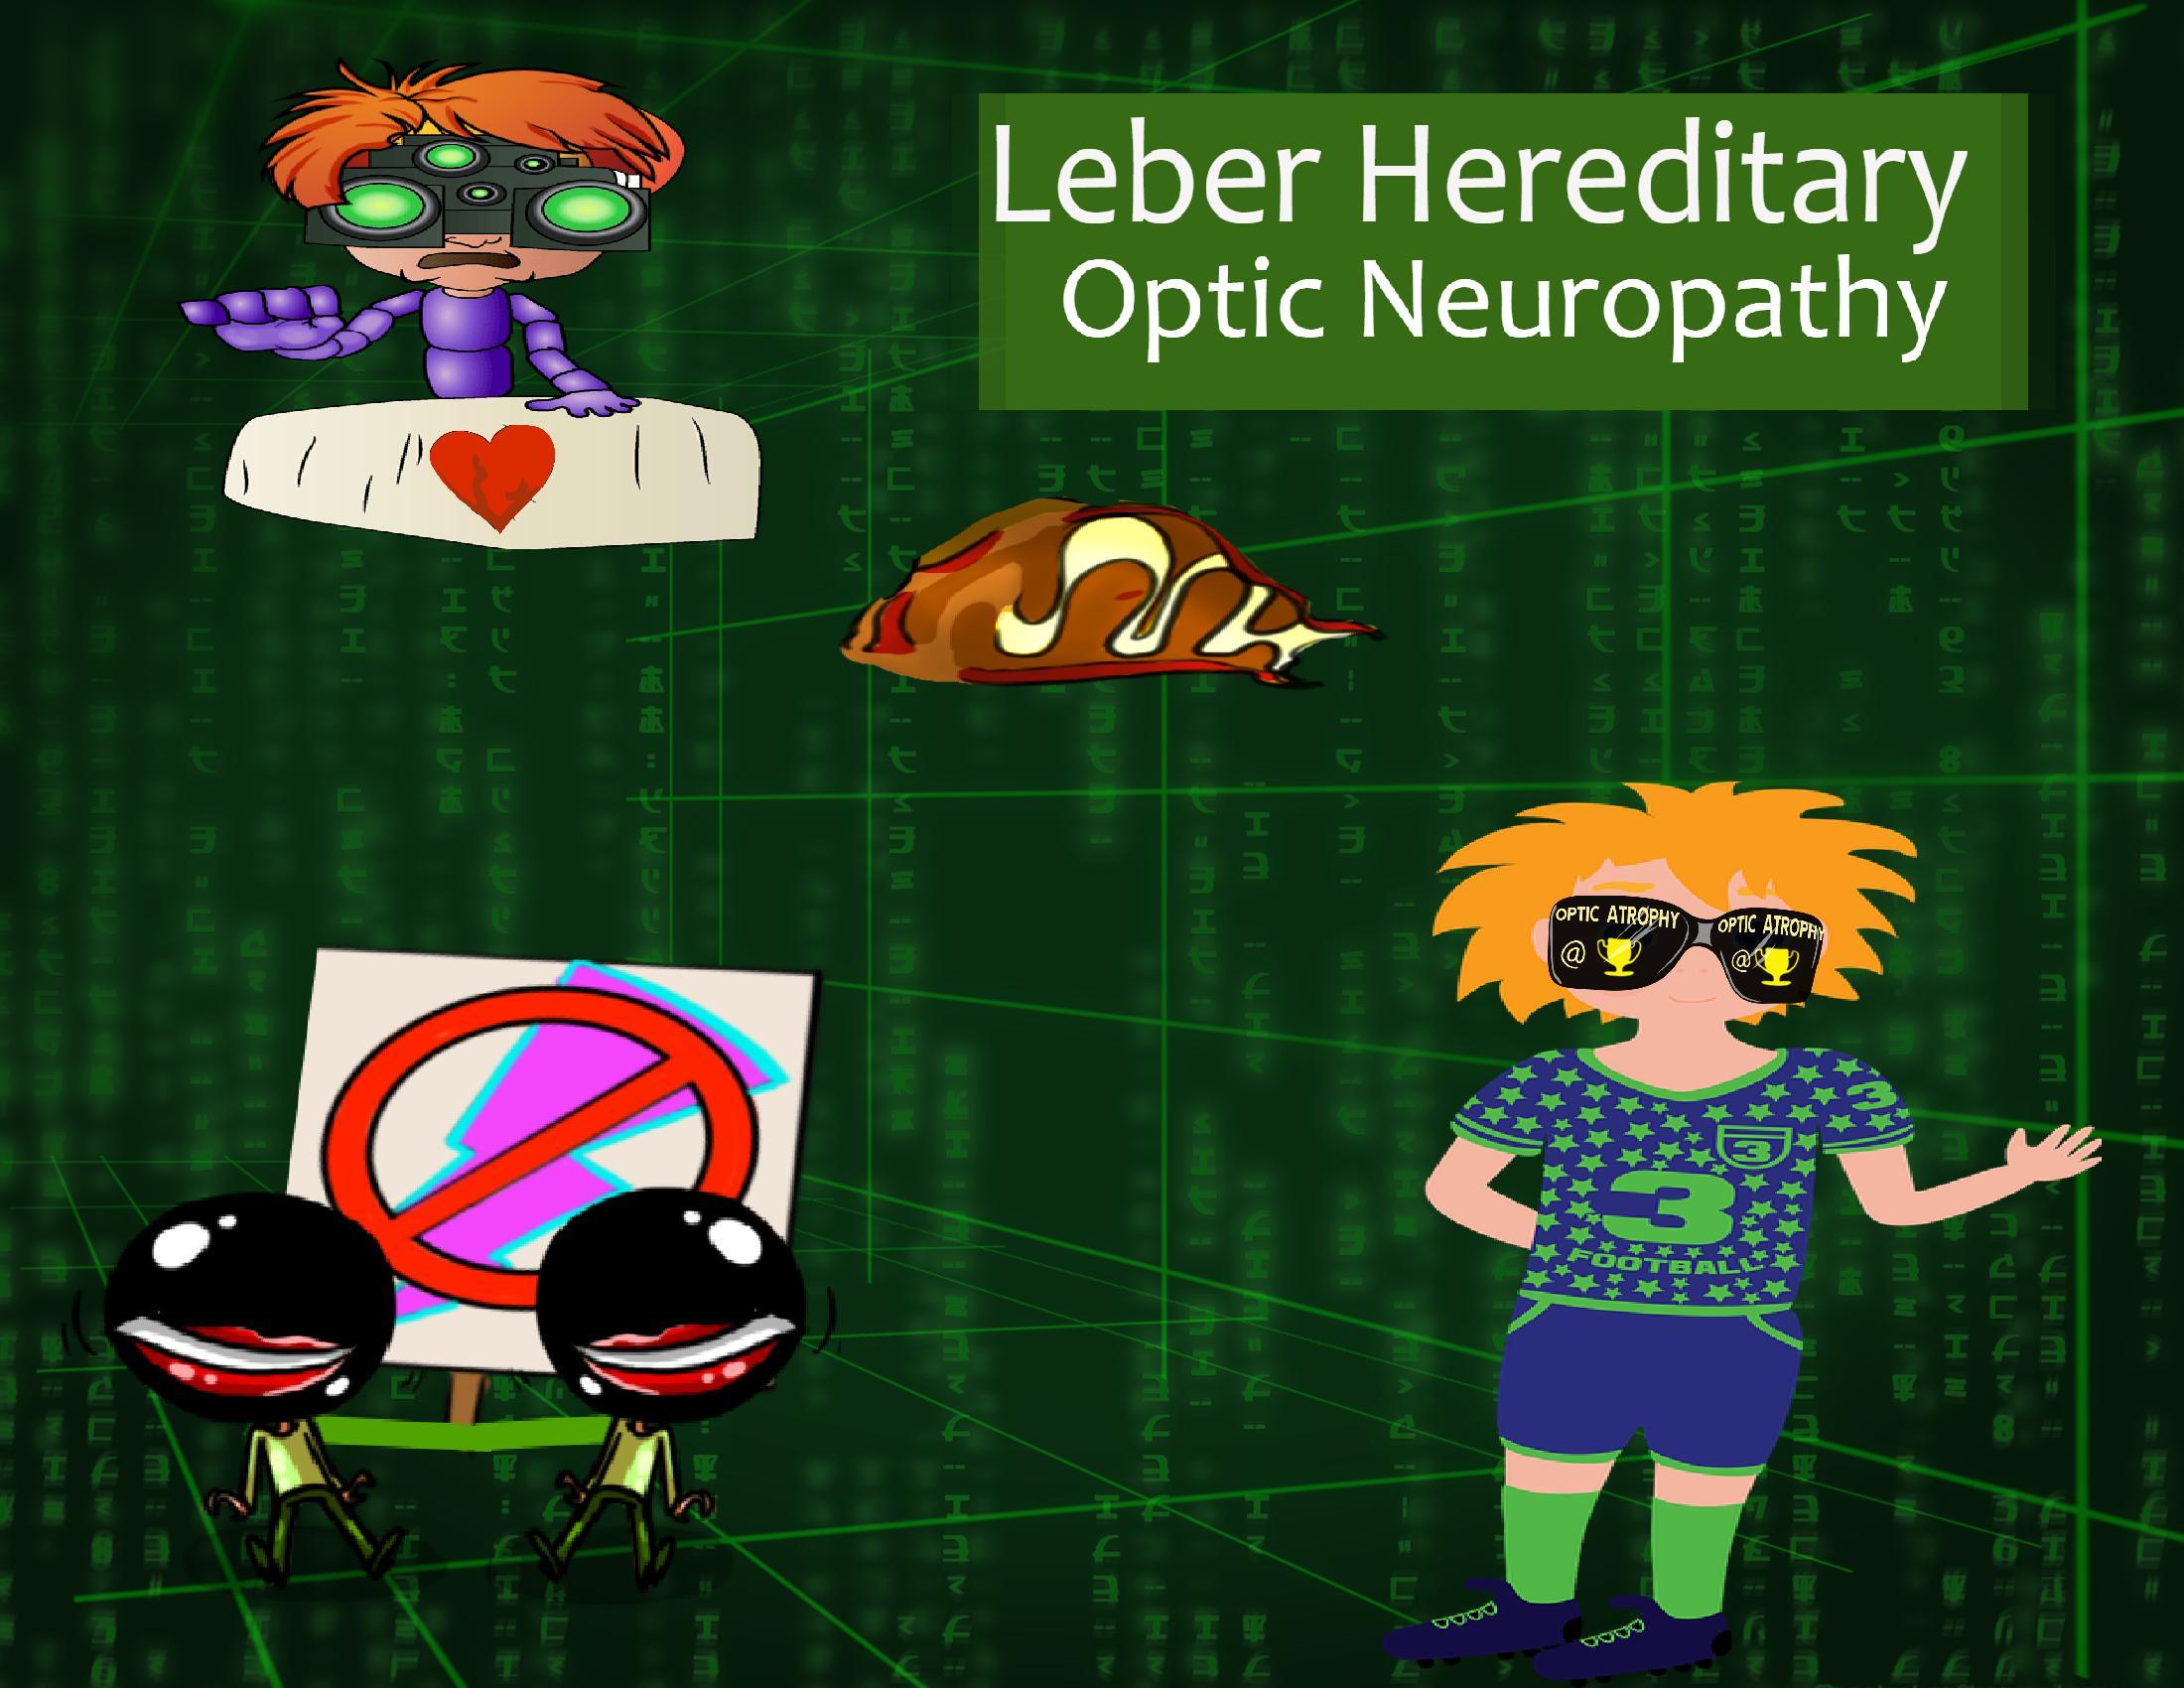 Leber Hereditary Optic Neuropathy